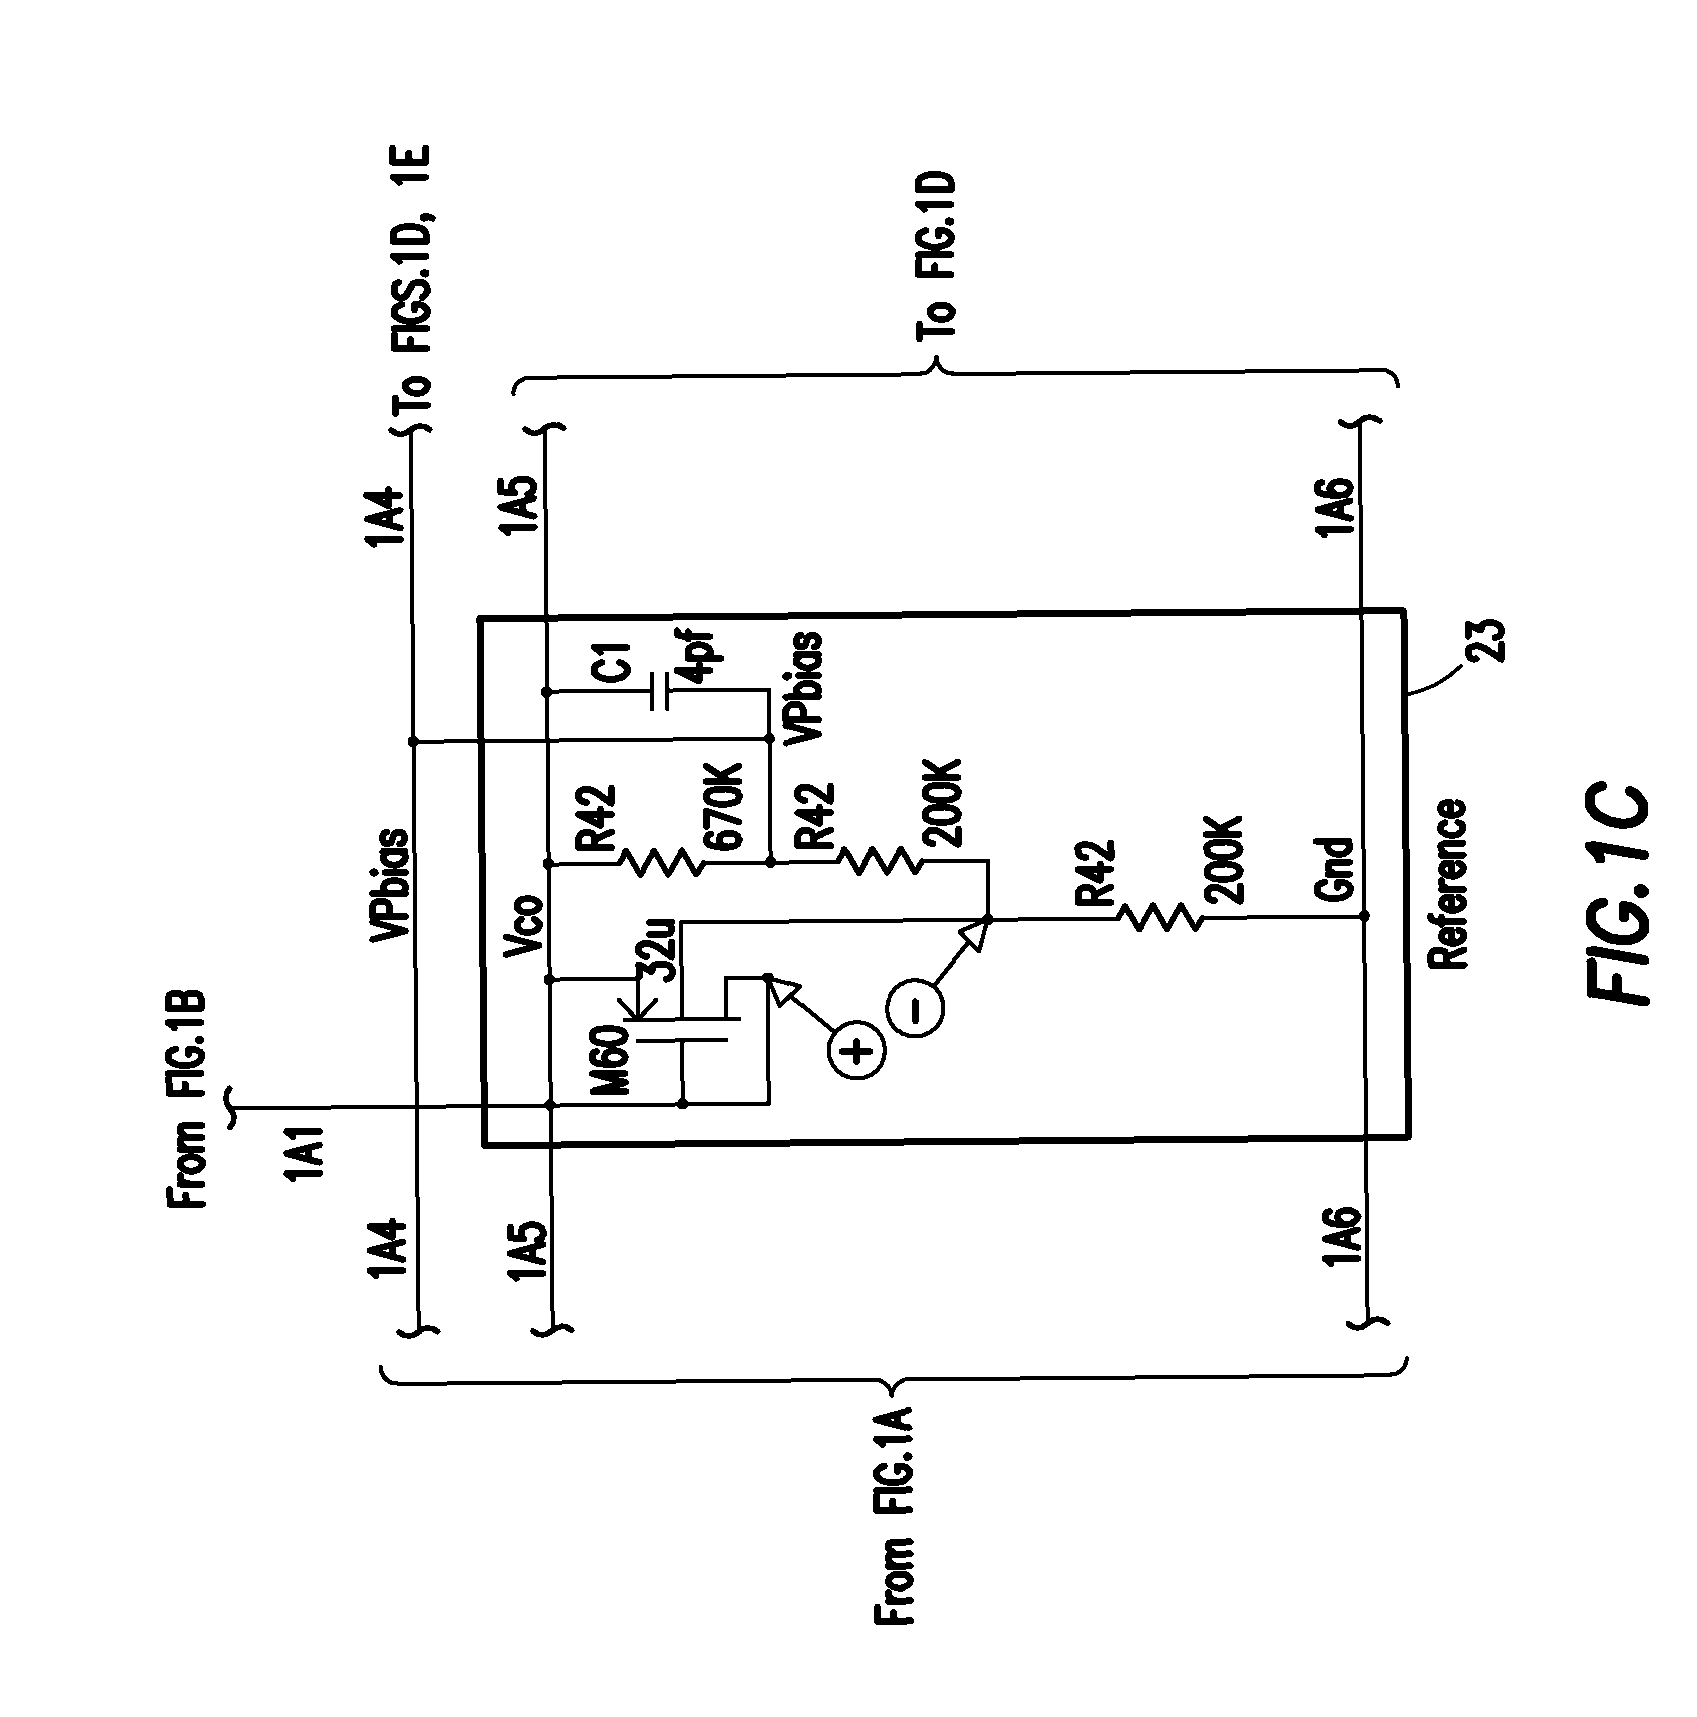 Low Voltage Oscillator : Patent us low voltage oscillator for medical